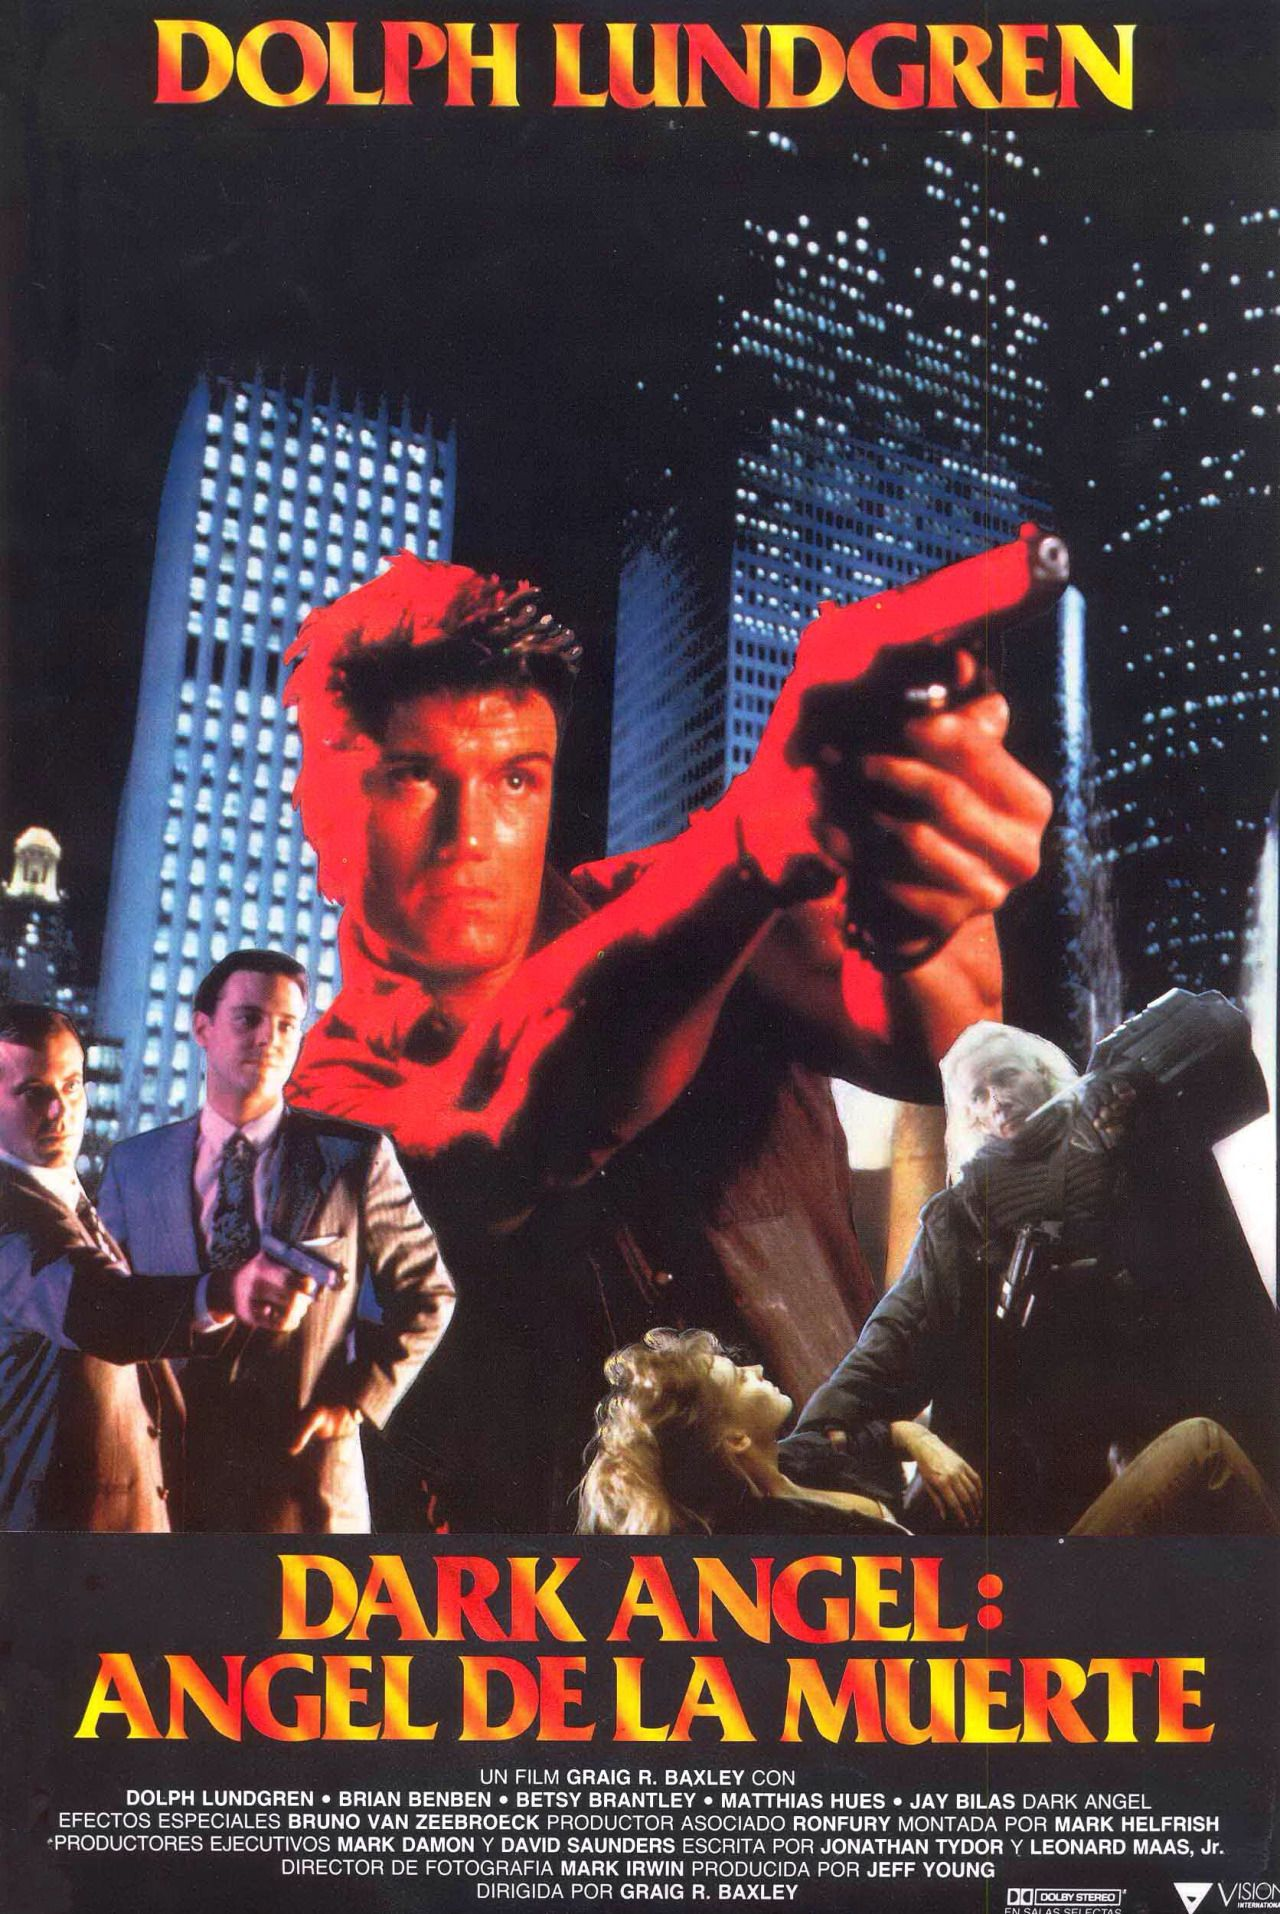 Theactioneer Action Movie Poster Dark Angel Streaming Movies Online